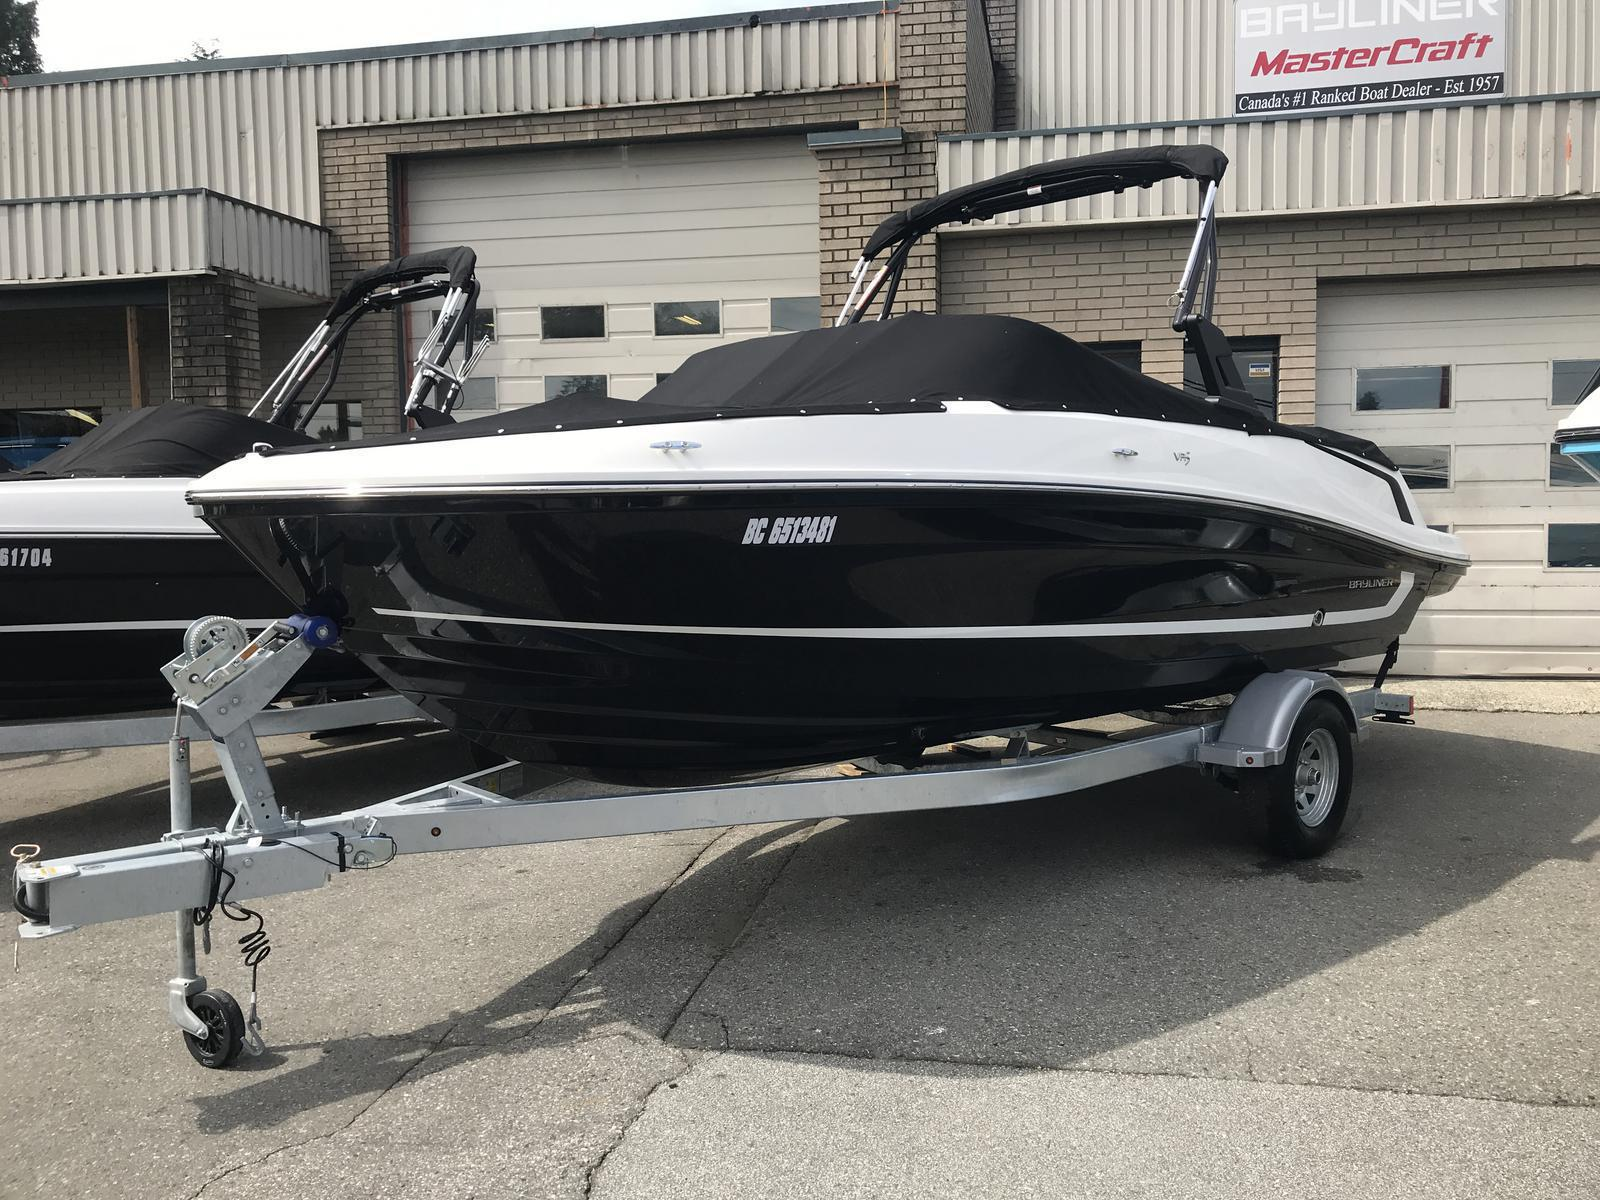 2019 Bayliner boat for sale, model of the boat is VR5 Bowrider & Image # 1 of 22